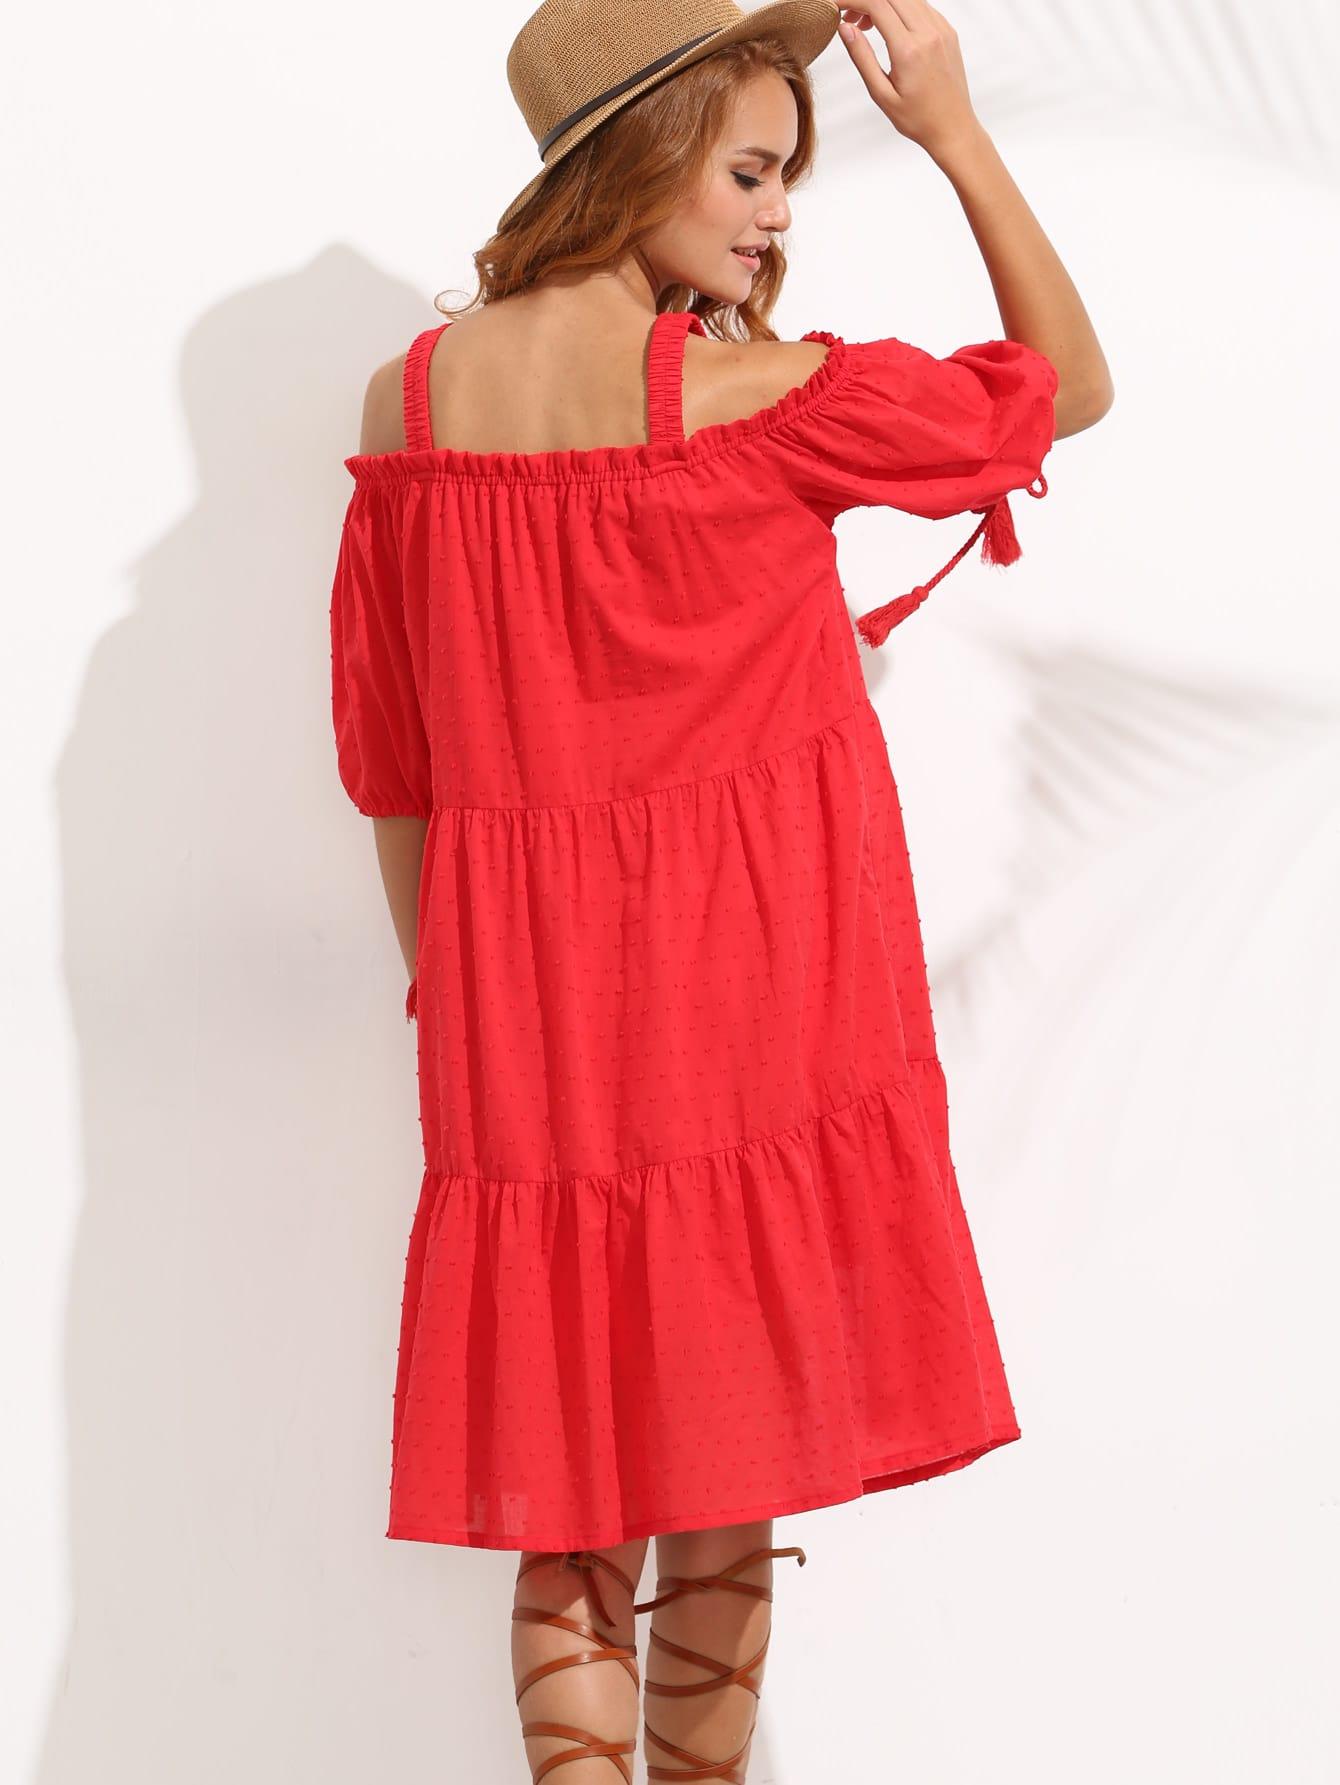 Black dress kisschasy lyrics - Red Tassel Dress